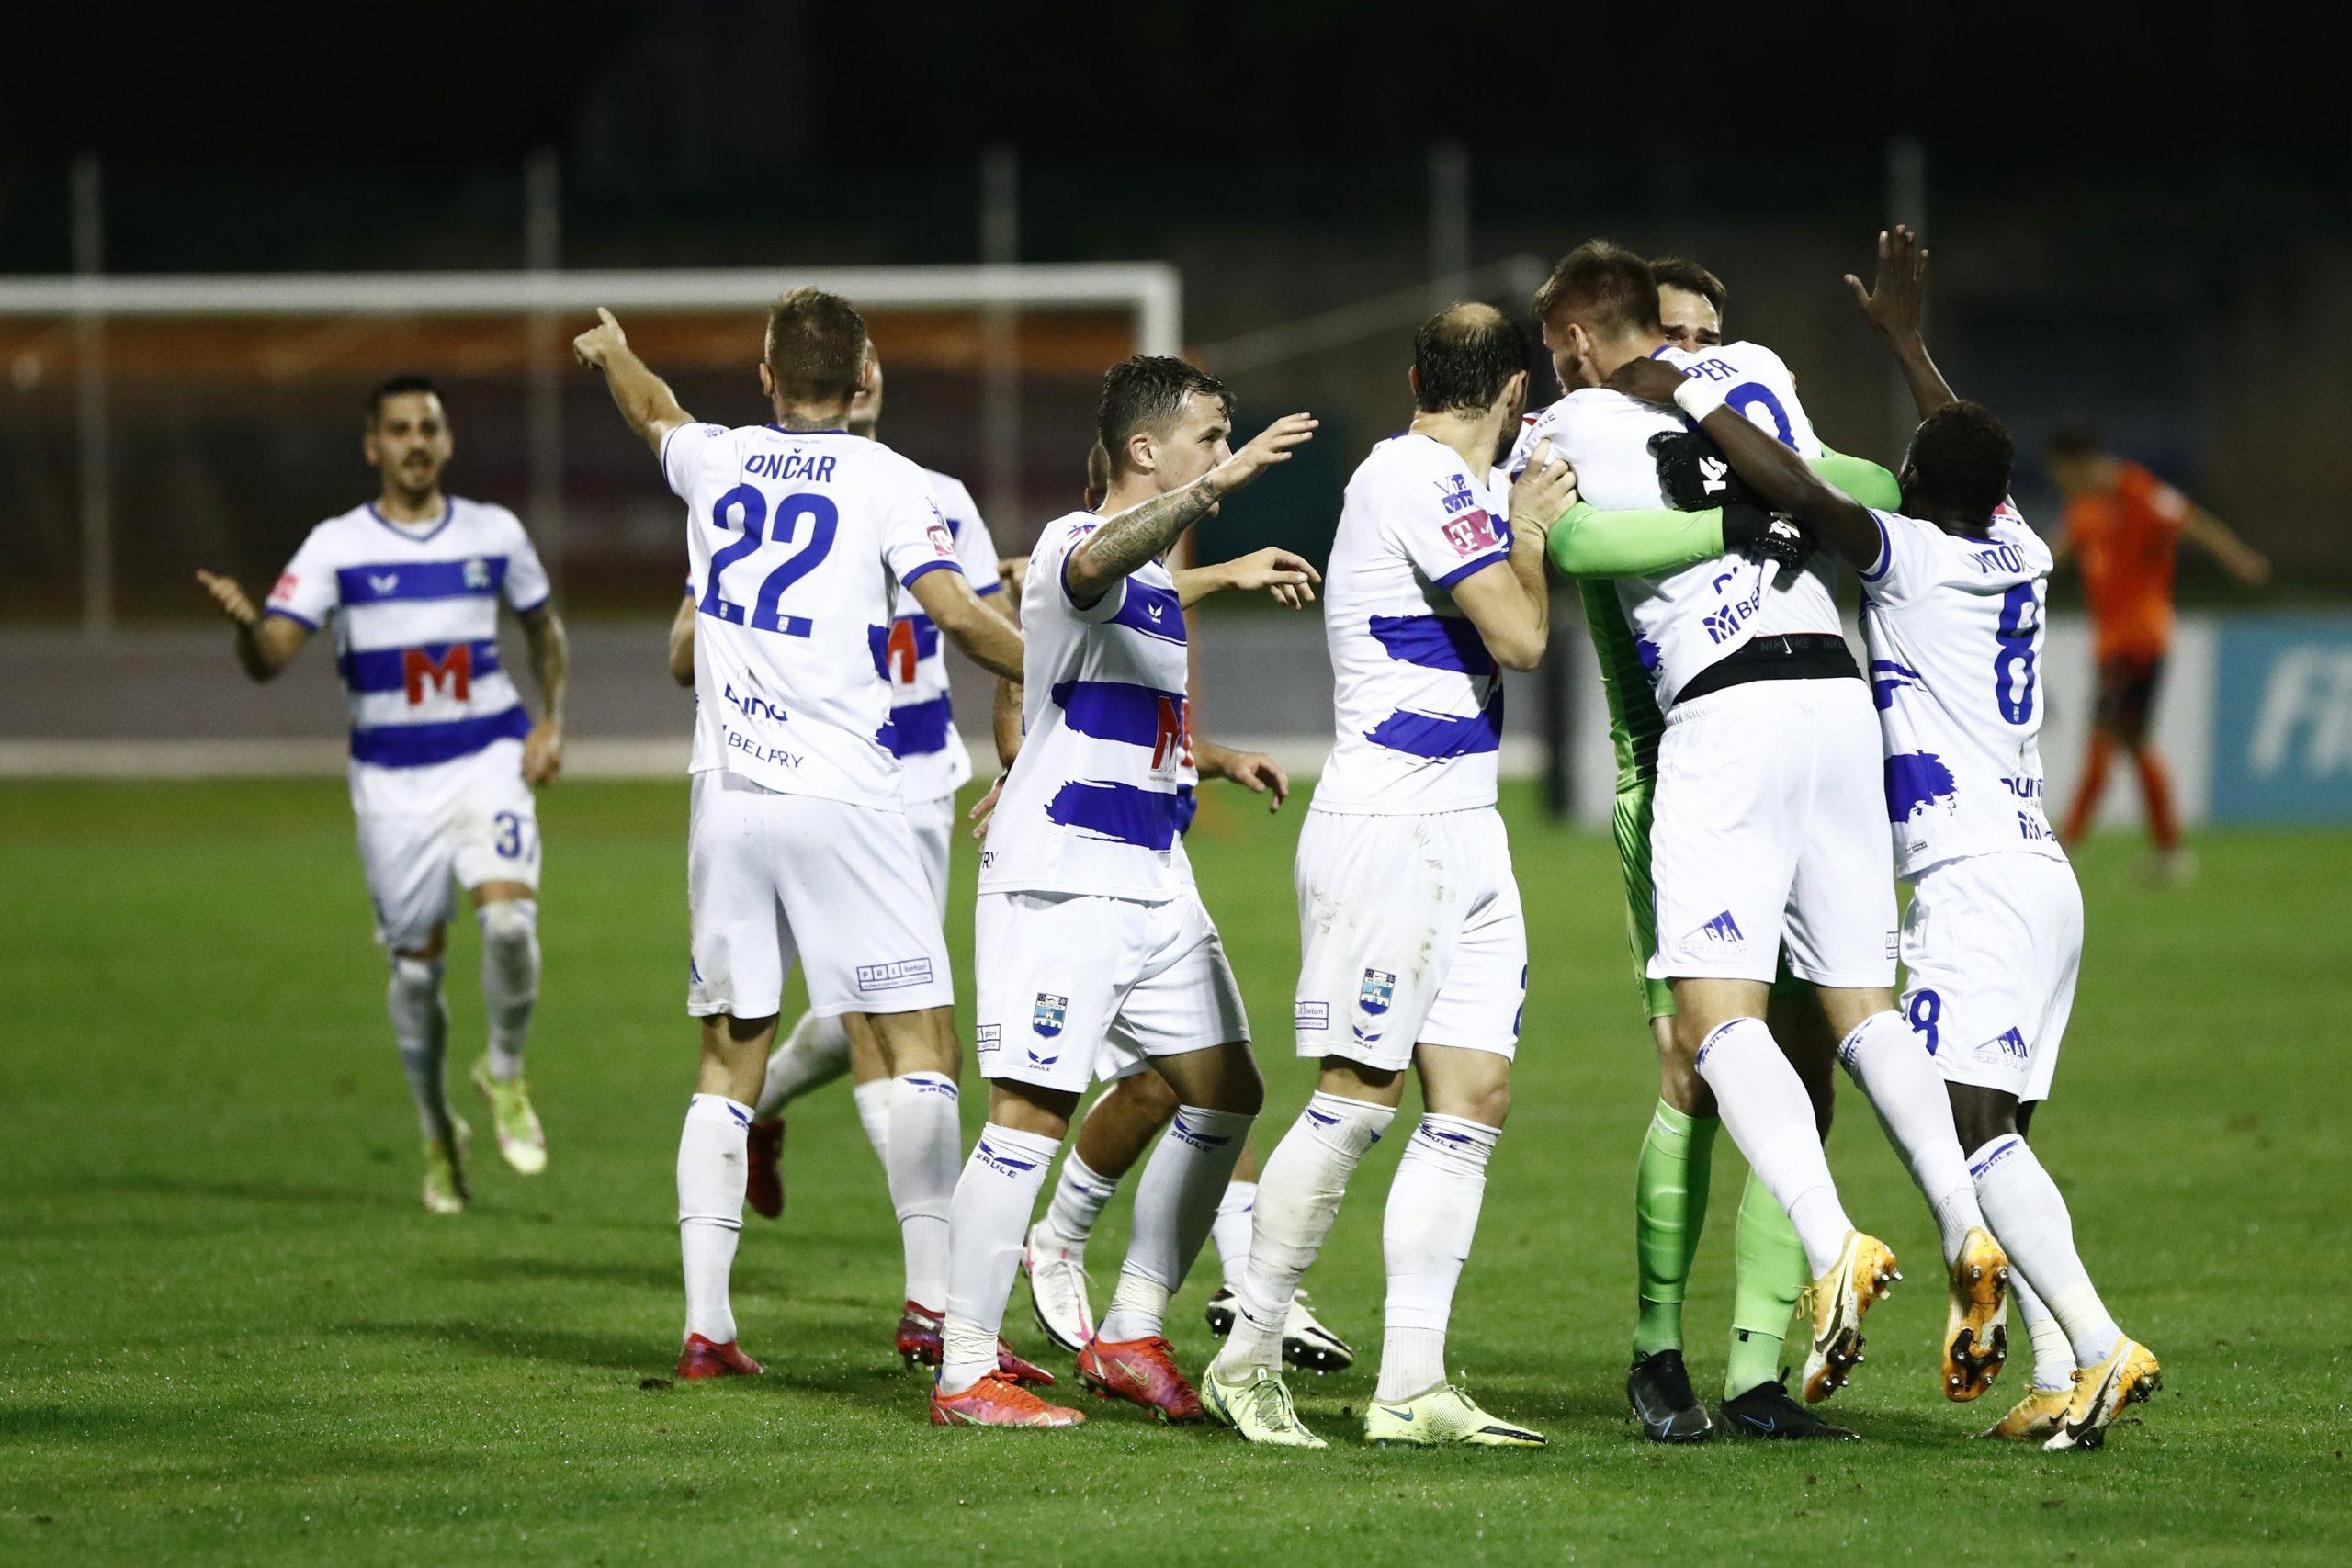 HNL: Dinamo i Osijek opravdali status favorita